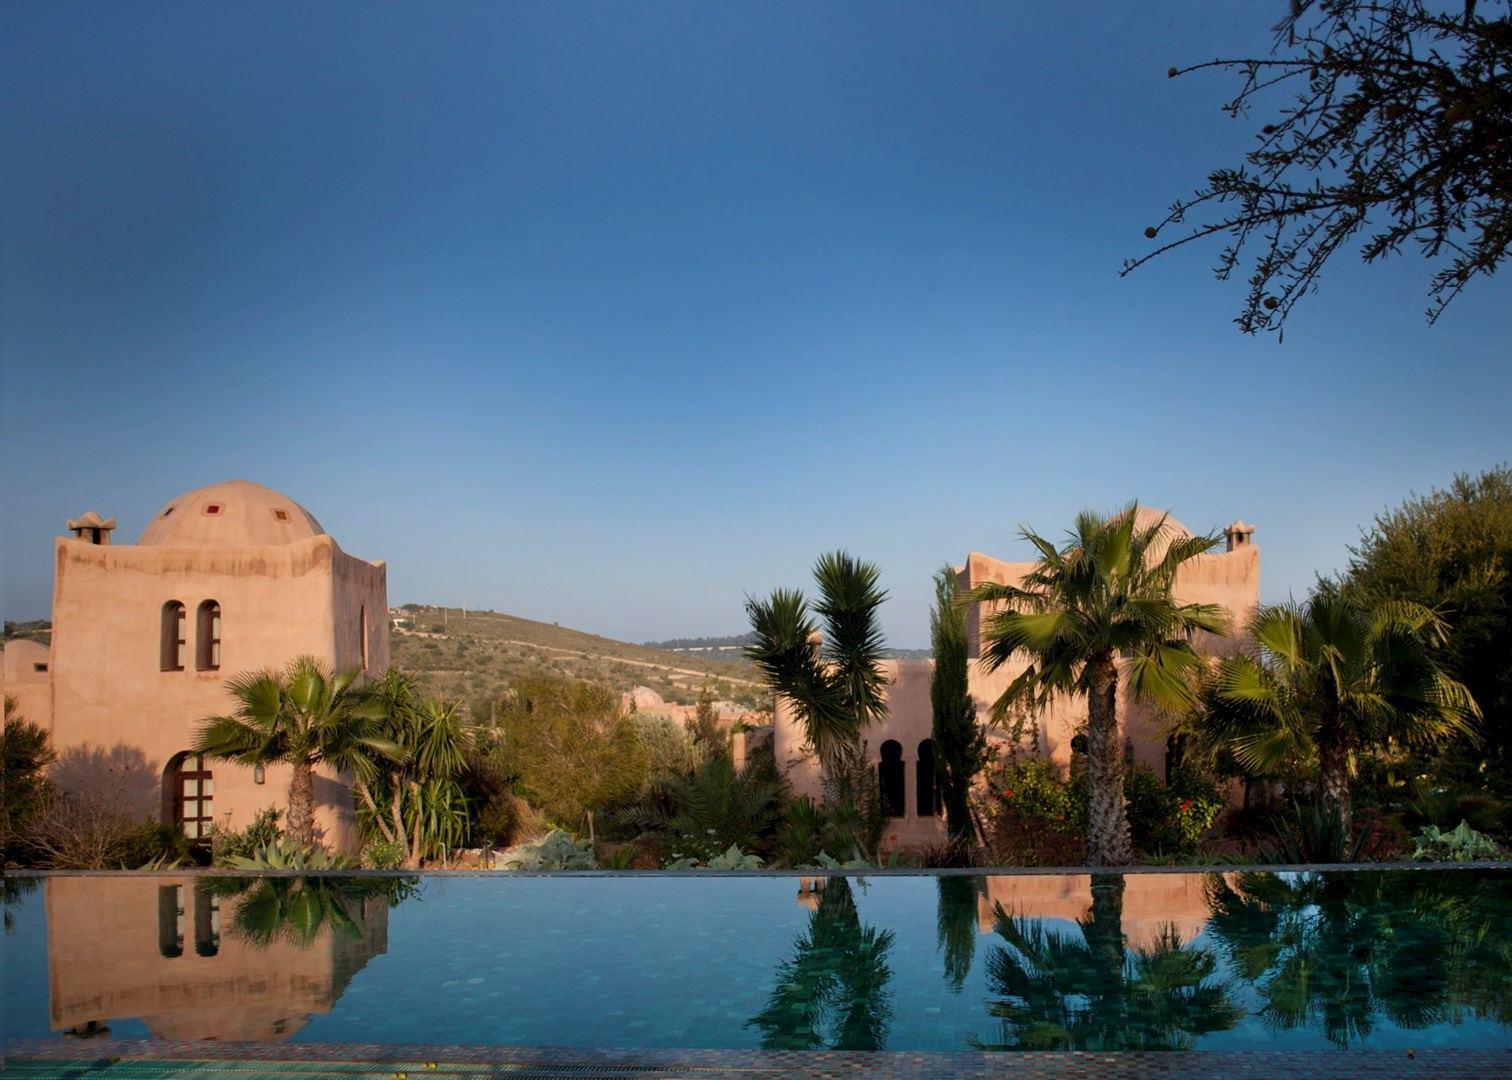 Jardins des douars hotels in essaouira audley travel - Les jardins de villa maroc essaouira ...